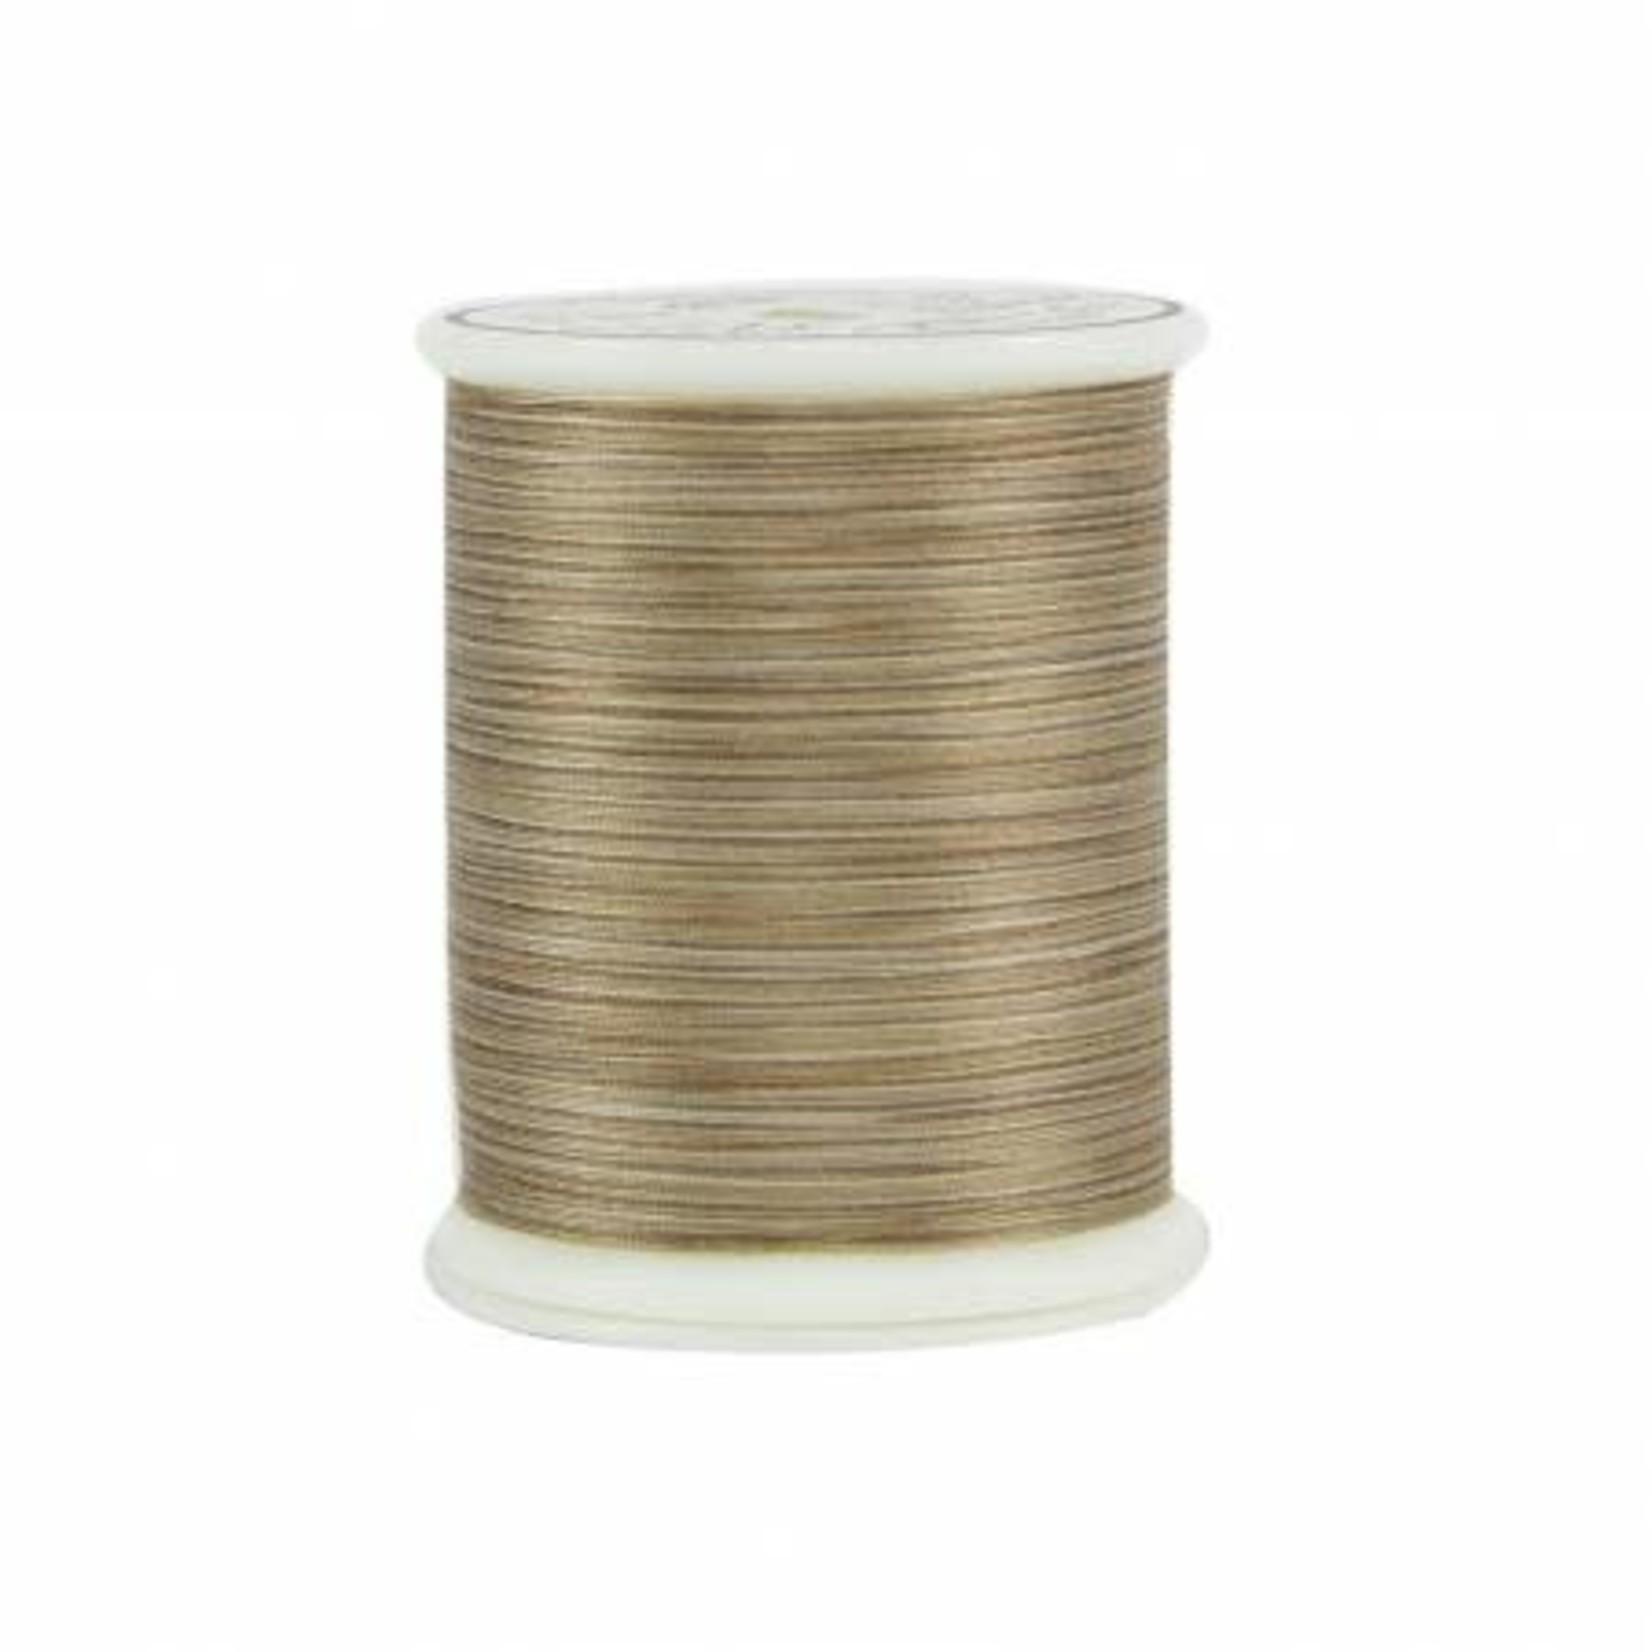 Superior Threads King Tut - #40 - 457 m - 0900 Sinai